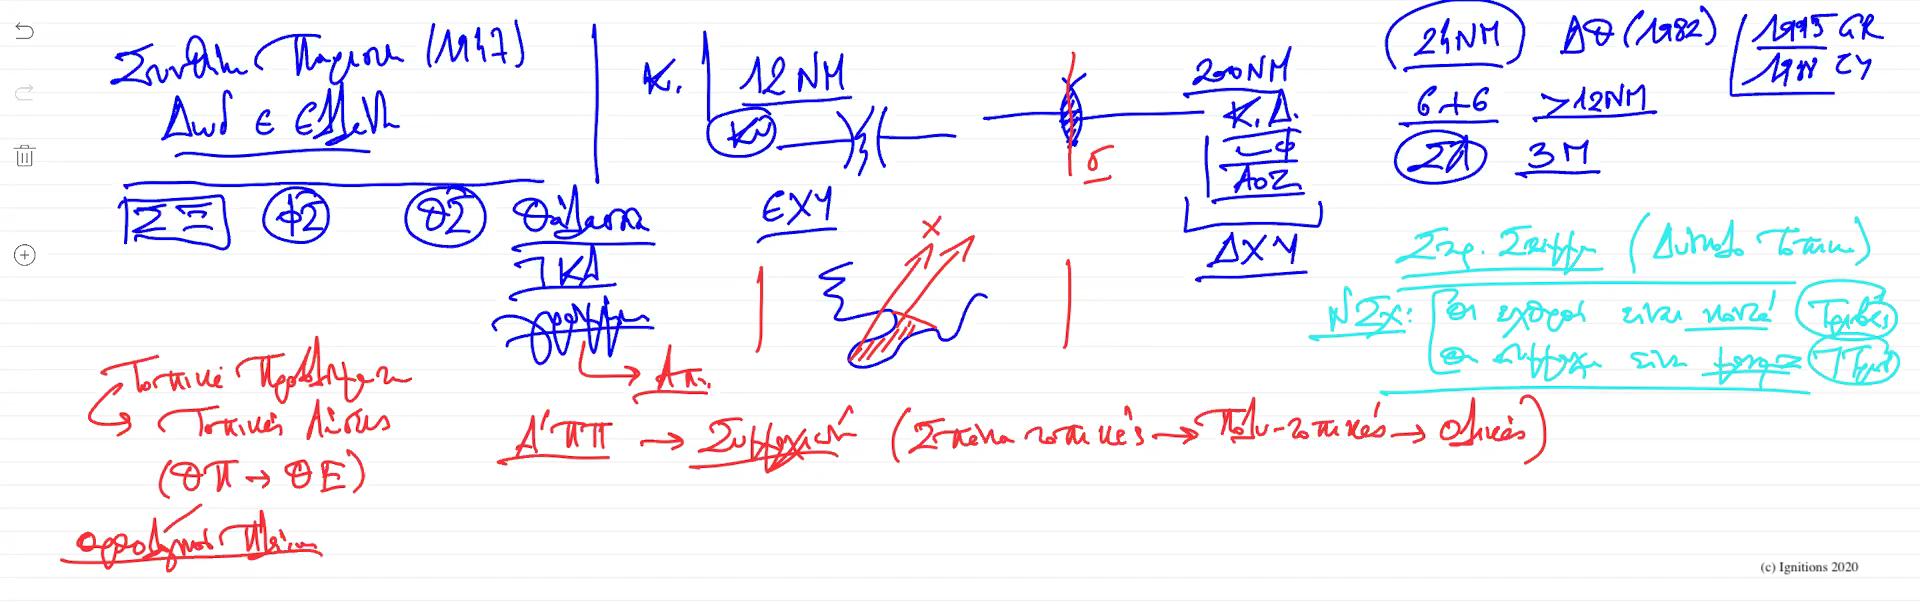 56459 - IV - e-Διάλεξη: Ελληνική Γεωστρατηγική II. (Dessin)